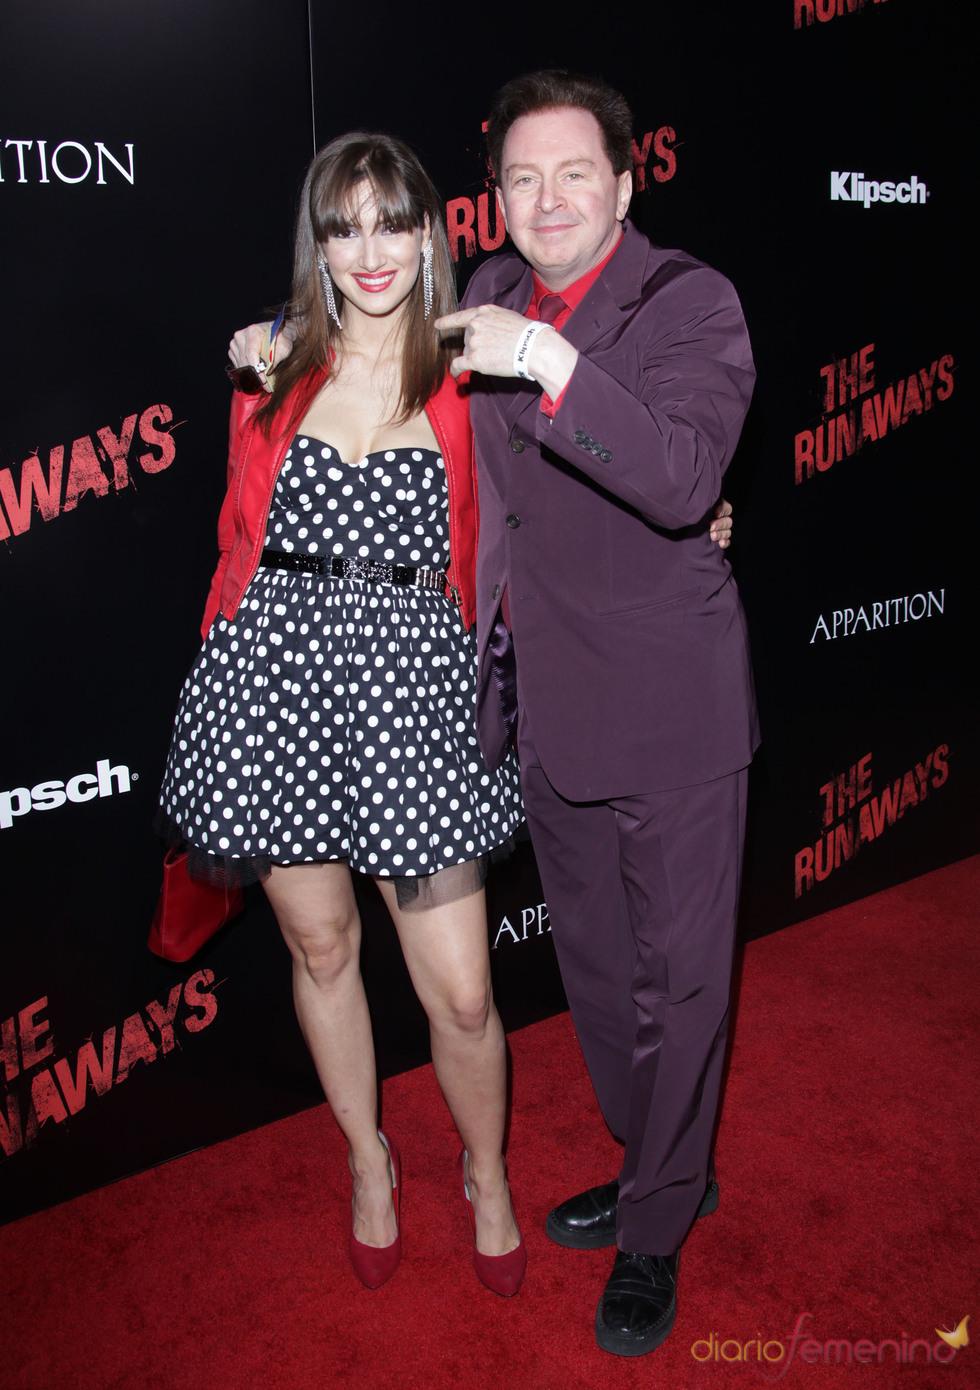 Premiere de 'The Runaways': Gerald Casale